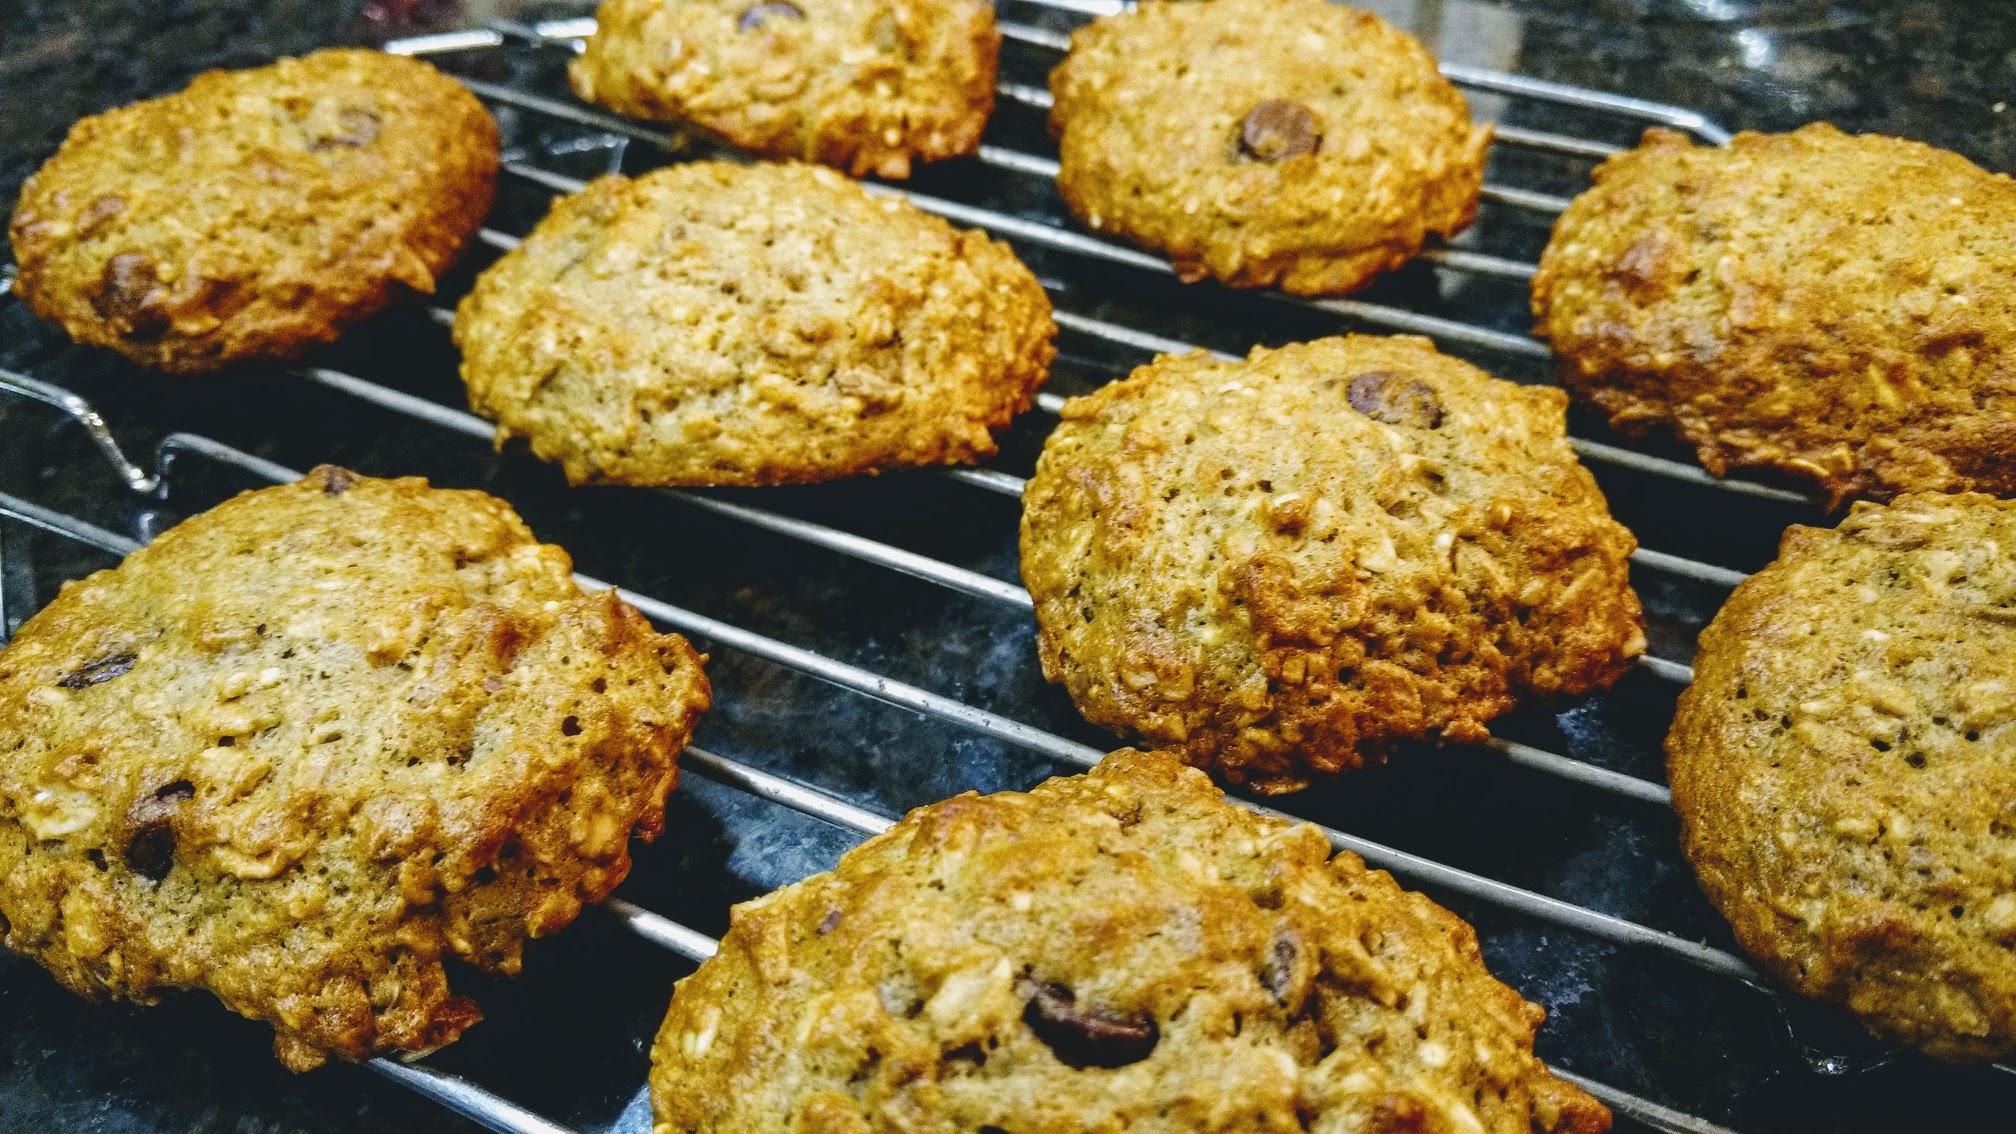 banana-chocolate-chip-oatmeal-cookies